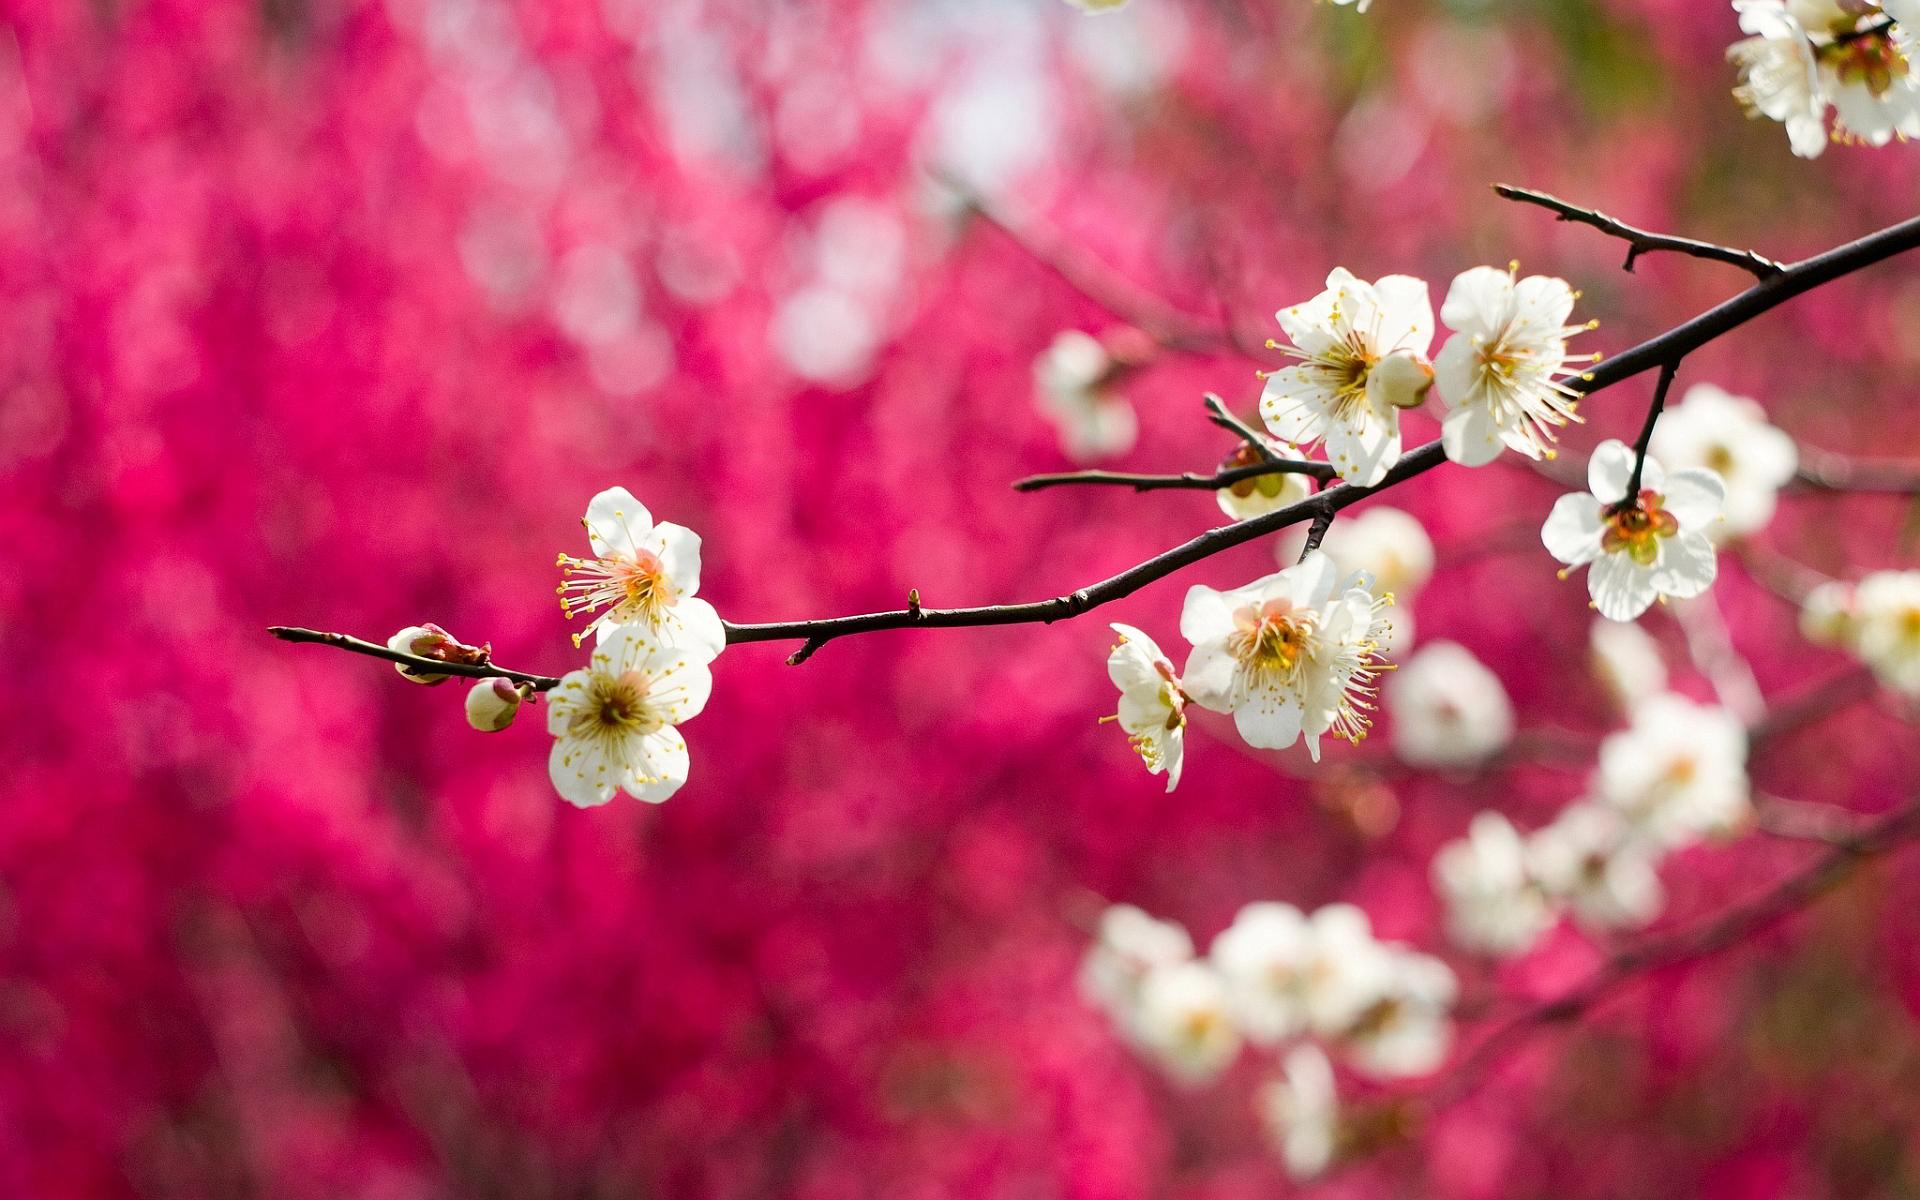 spring wallpaper white - HD Desktop Wallpapers | 4k HD